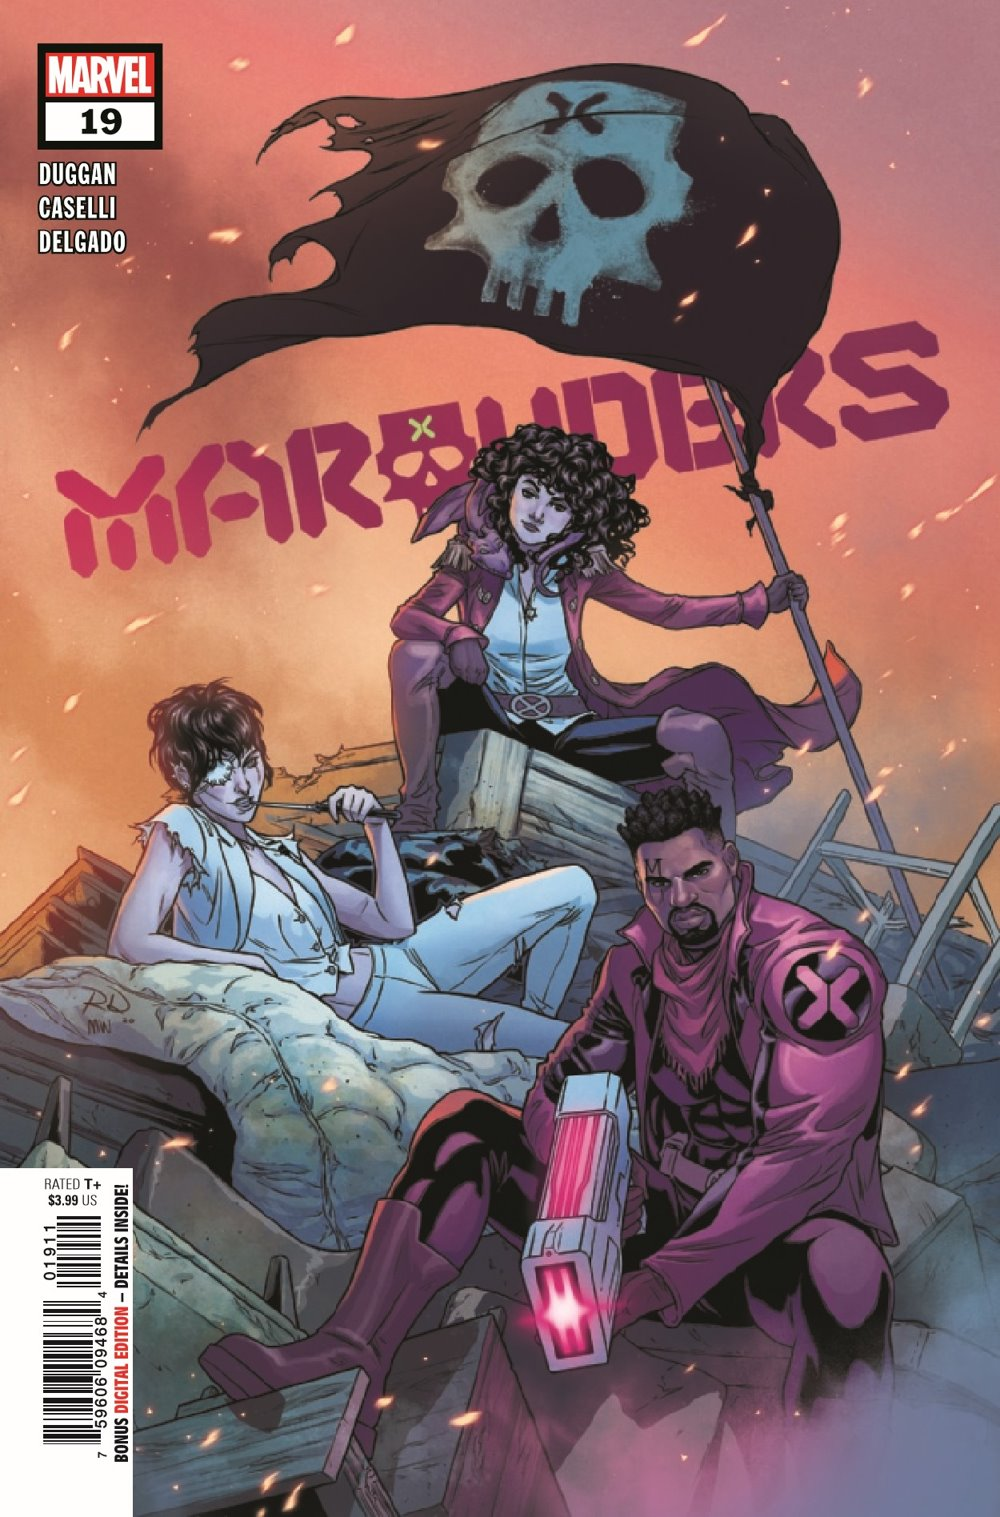 MARAUDERS2019019_Preview-1 ComicList Previews: MARAUDERS #19